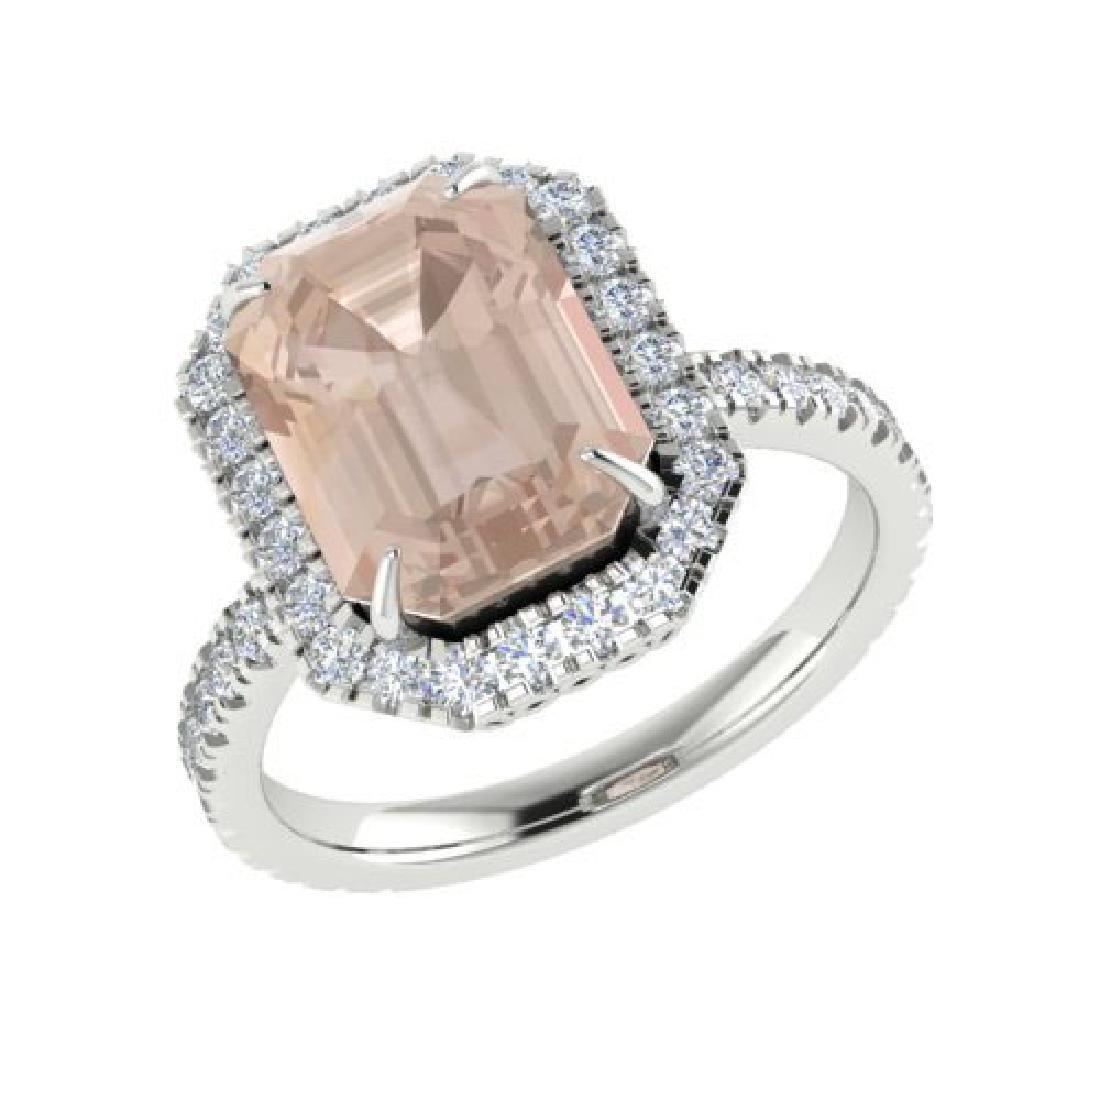 4.50 CTW Morganite & Micro Pave VS/SI Diamond Halo Ring - 2